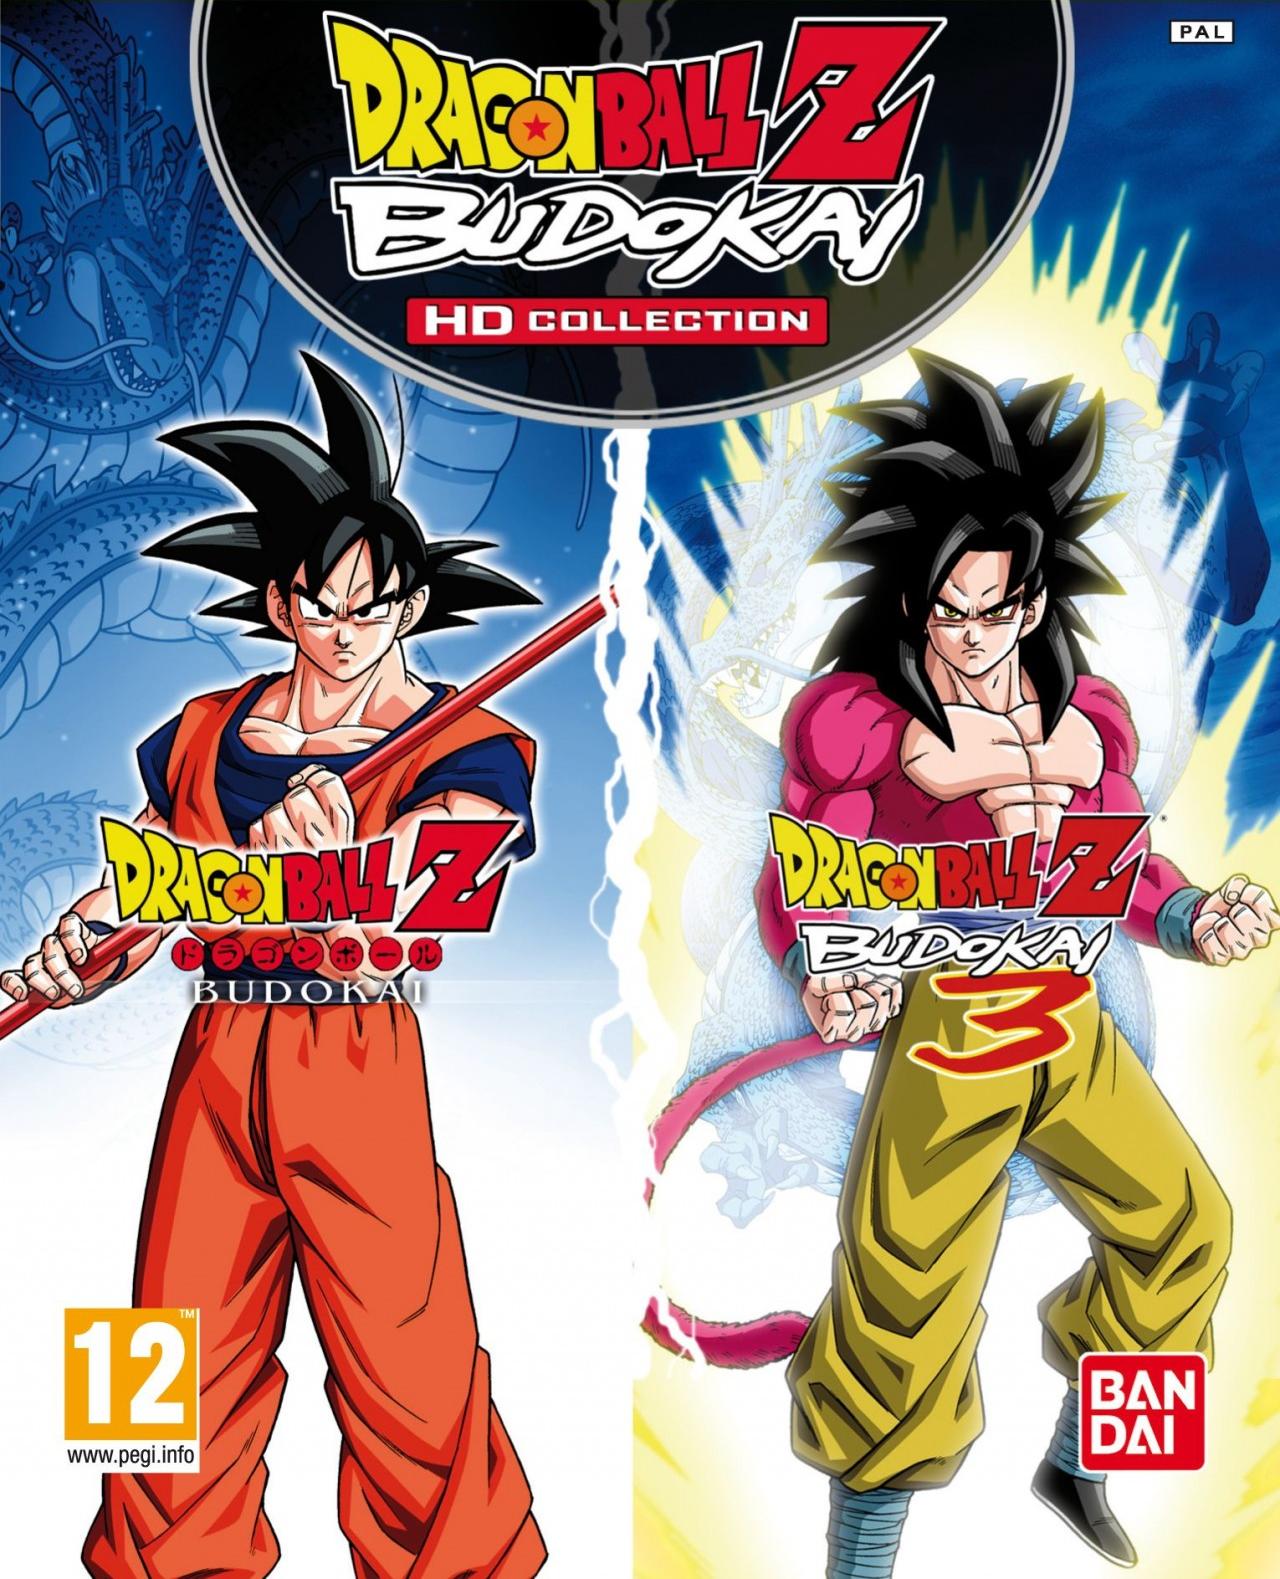 Dragon Ball Z: Budokai HD Collection | Dragon Ball Wiki